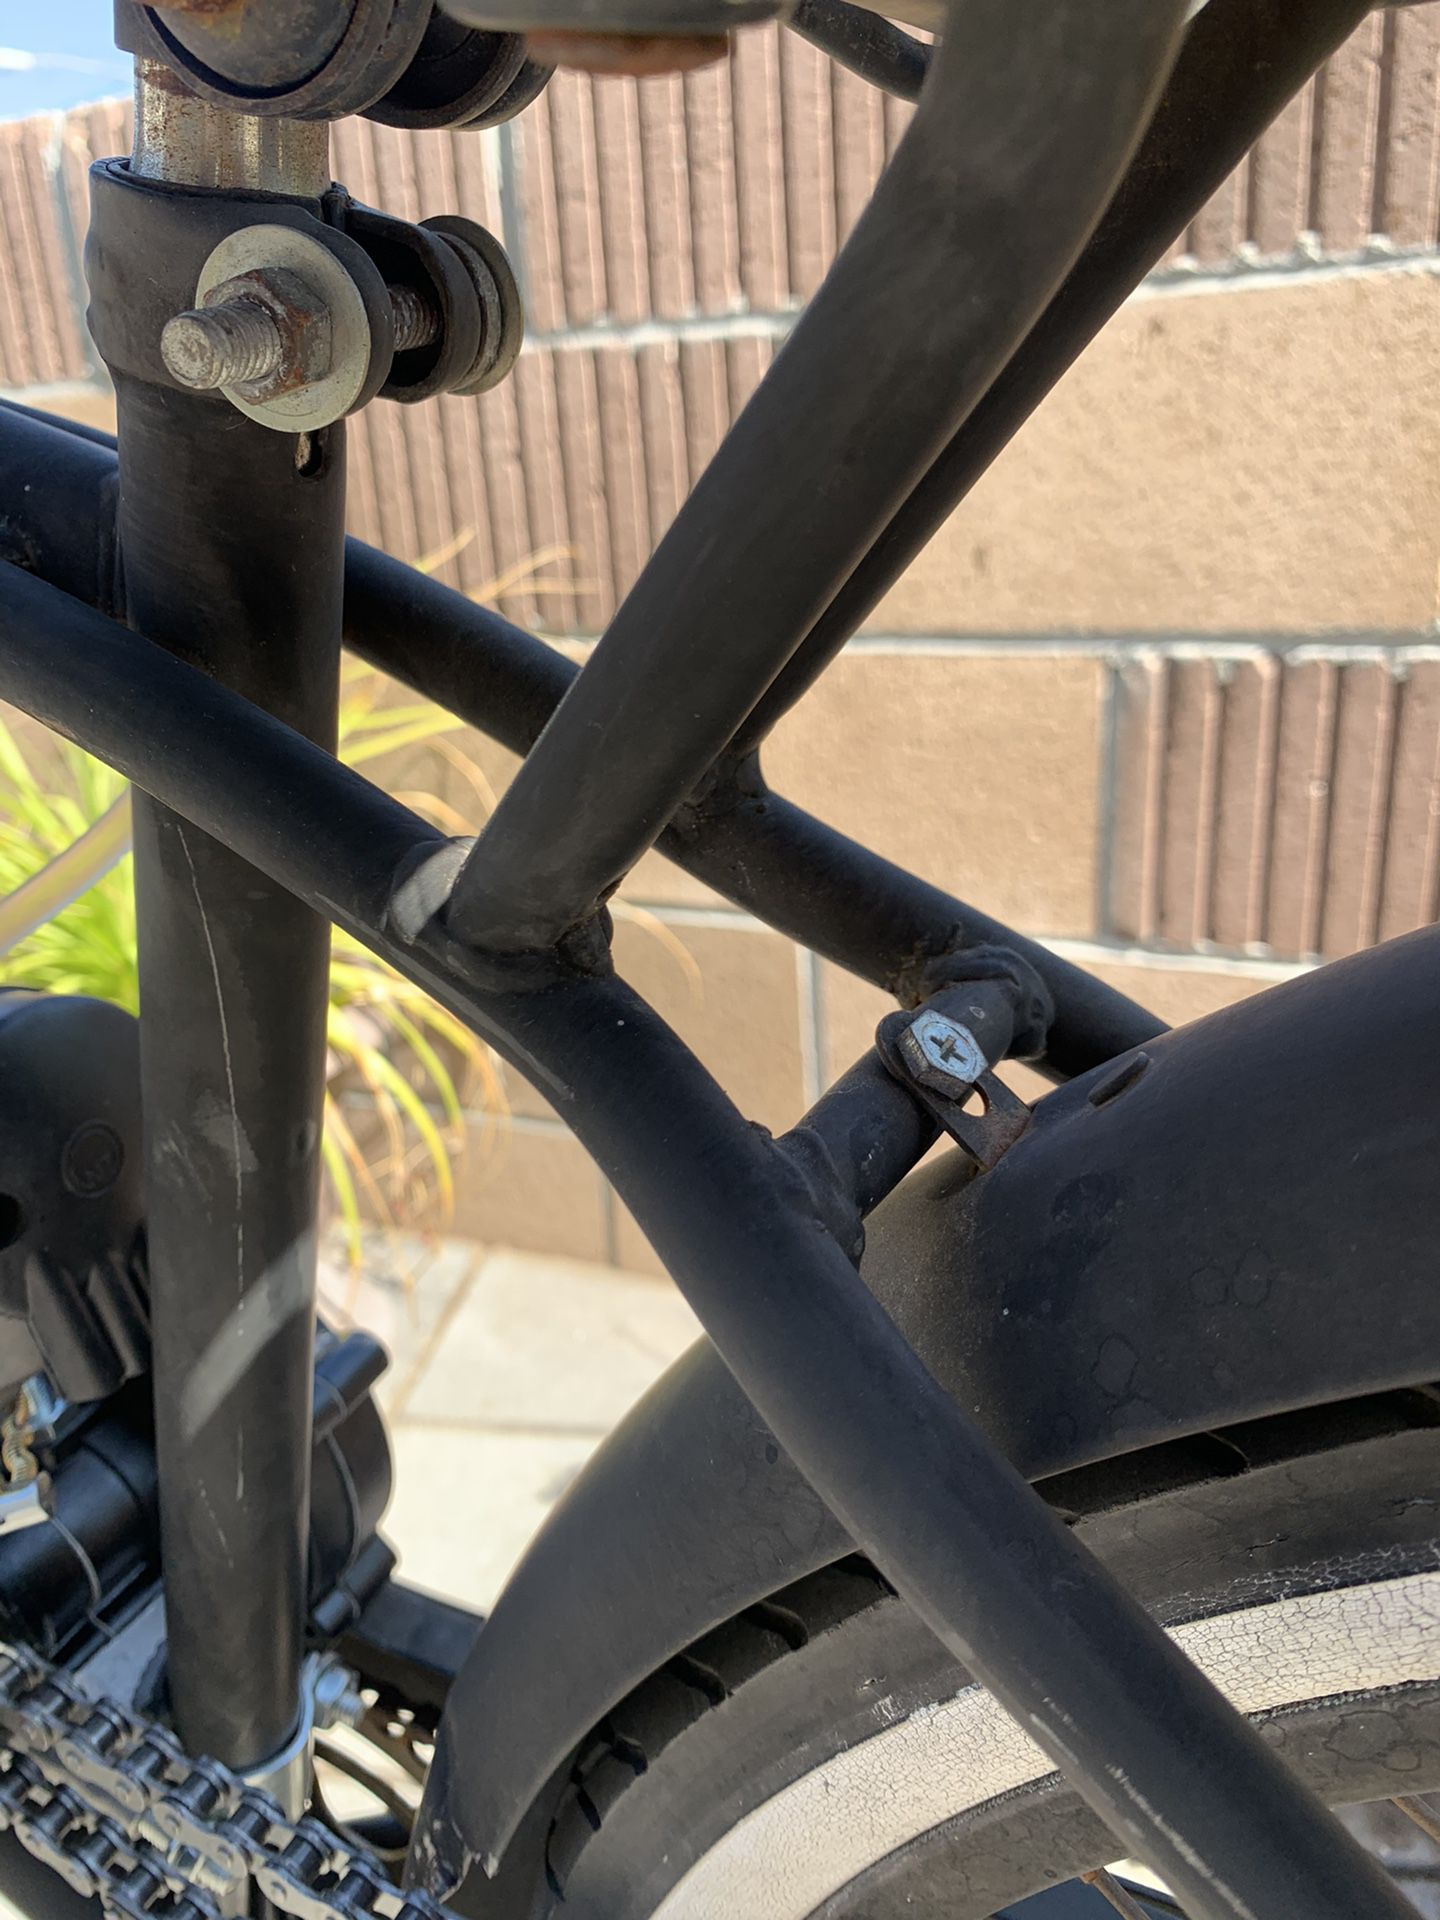 80cc Motorized Bike / Beach Cruiser Ready To Ride